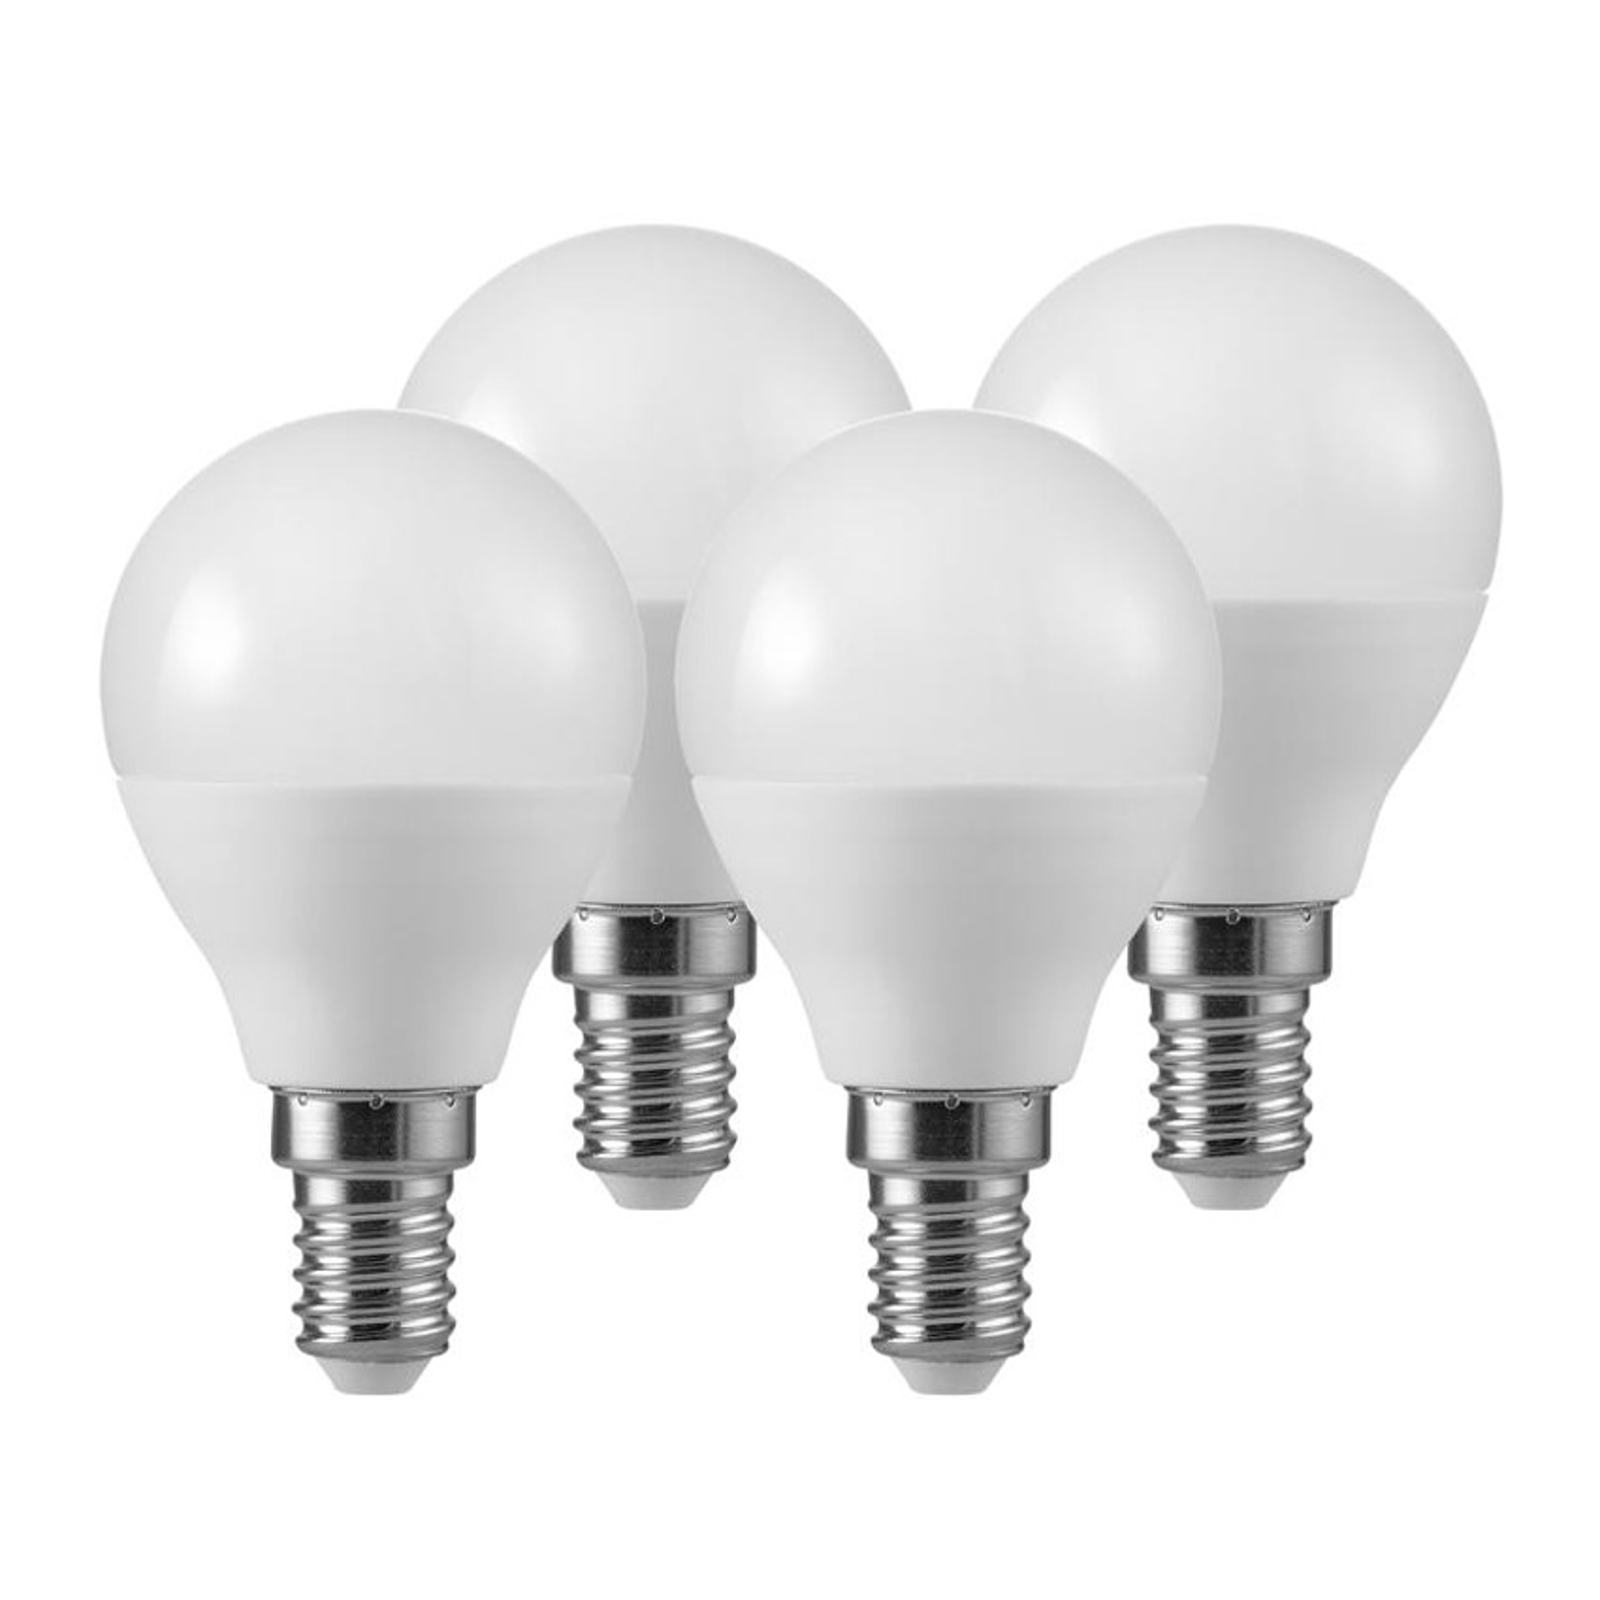 LED-Tropfenlampe E14 5,5W 2.700K matt 3+1 Set